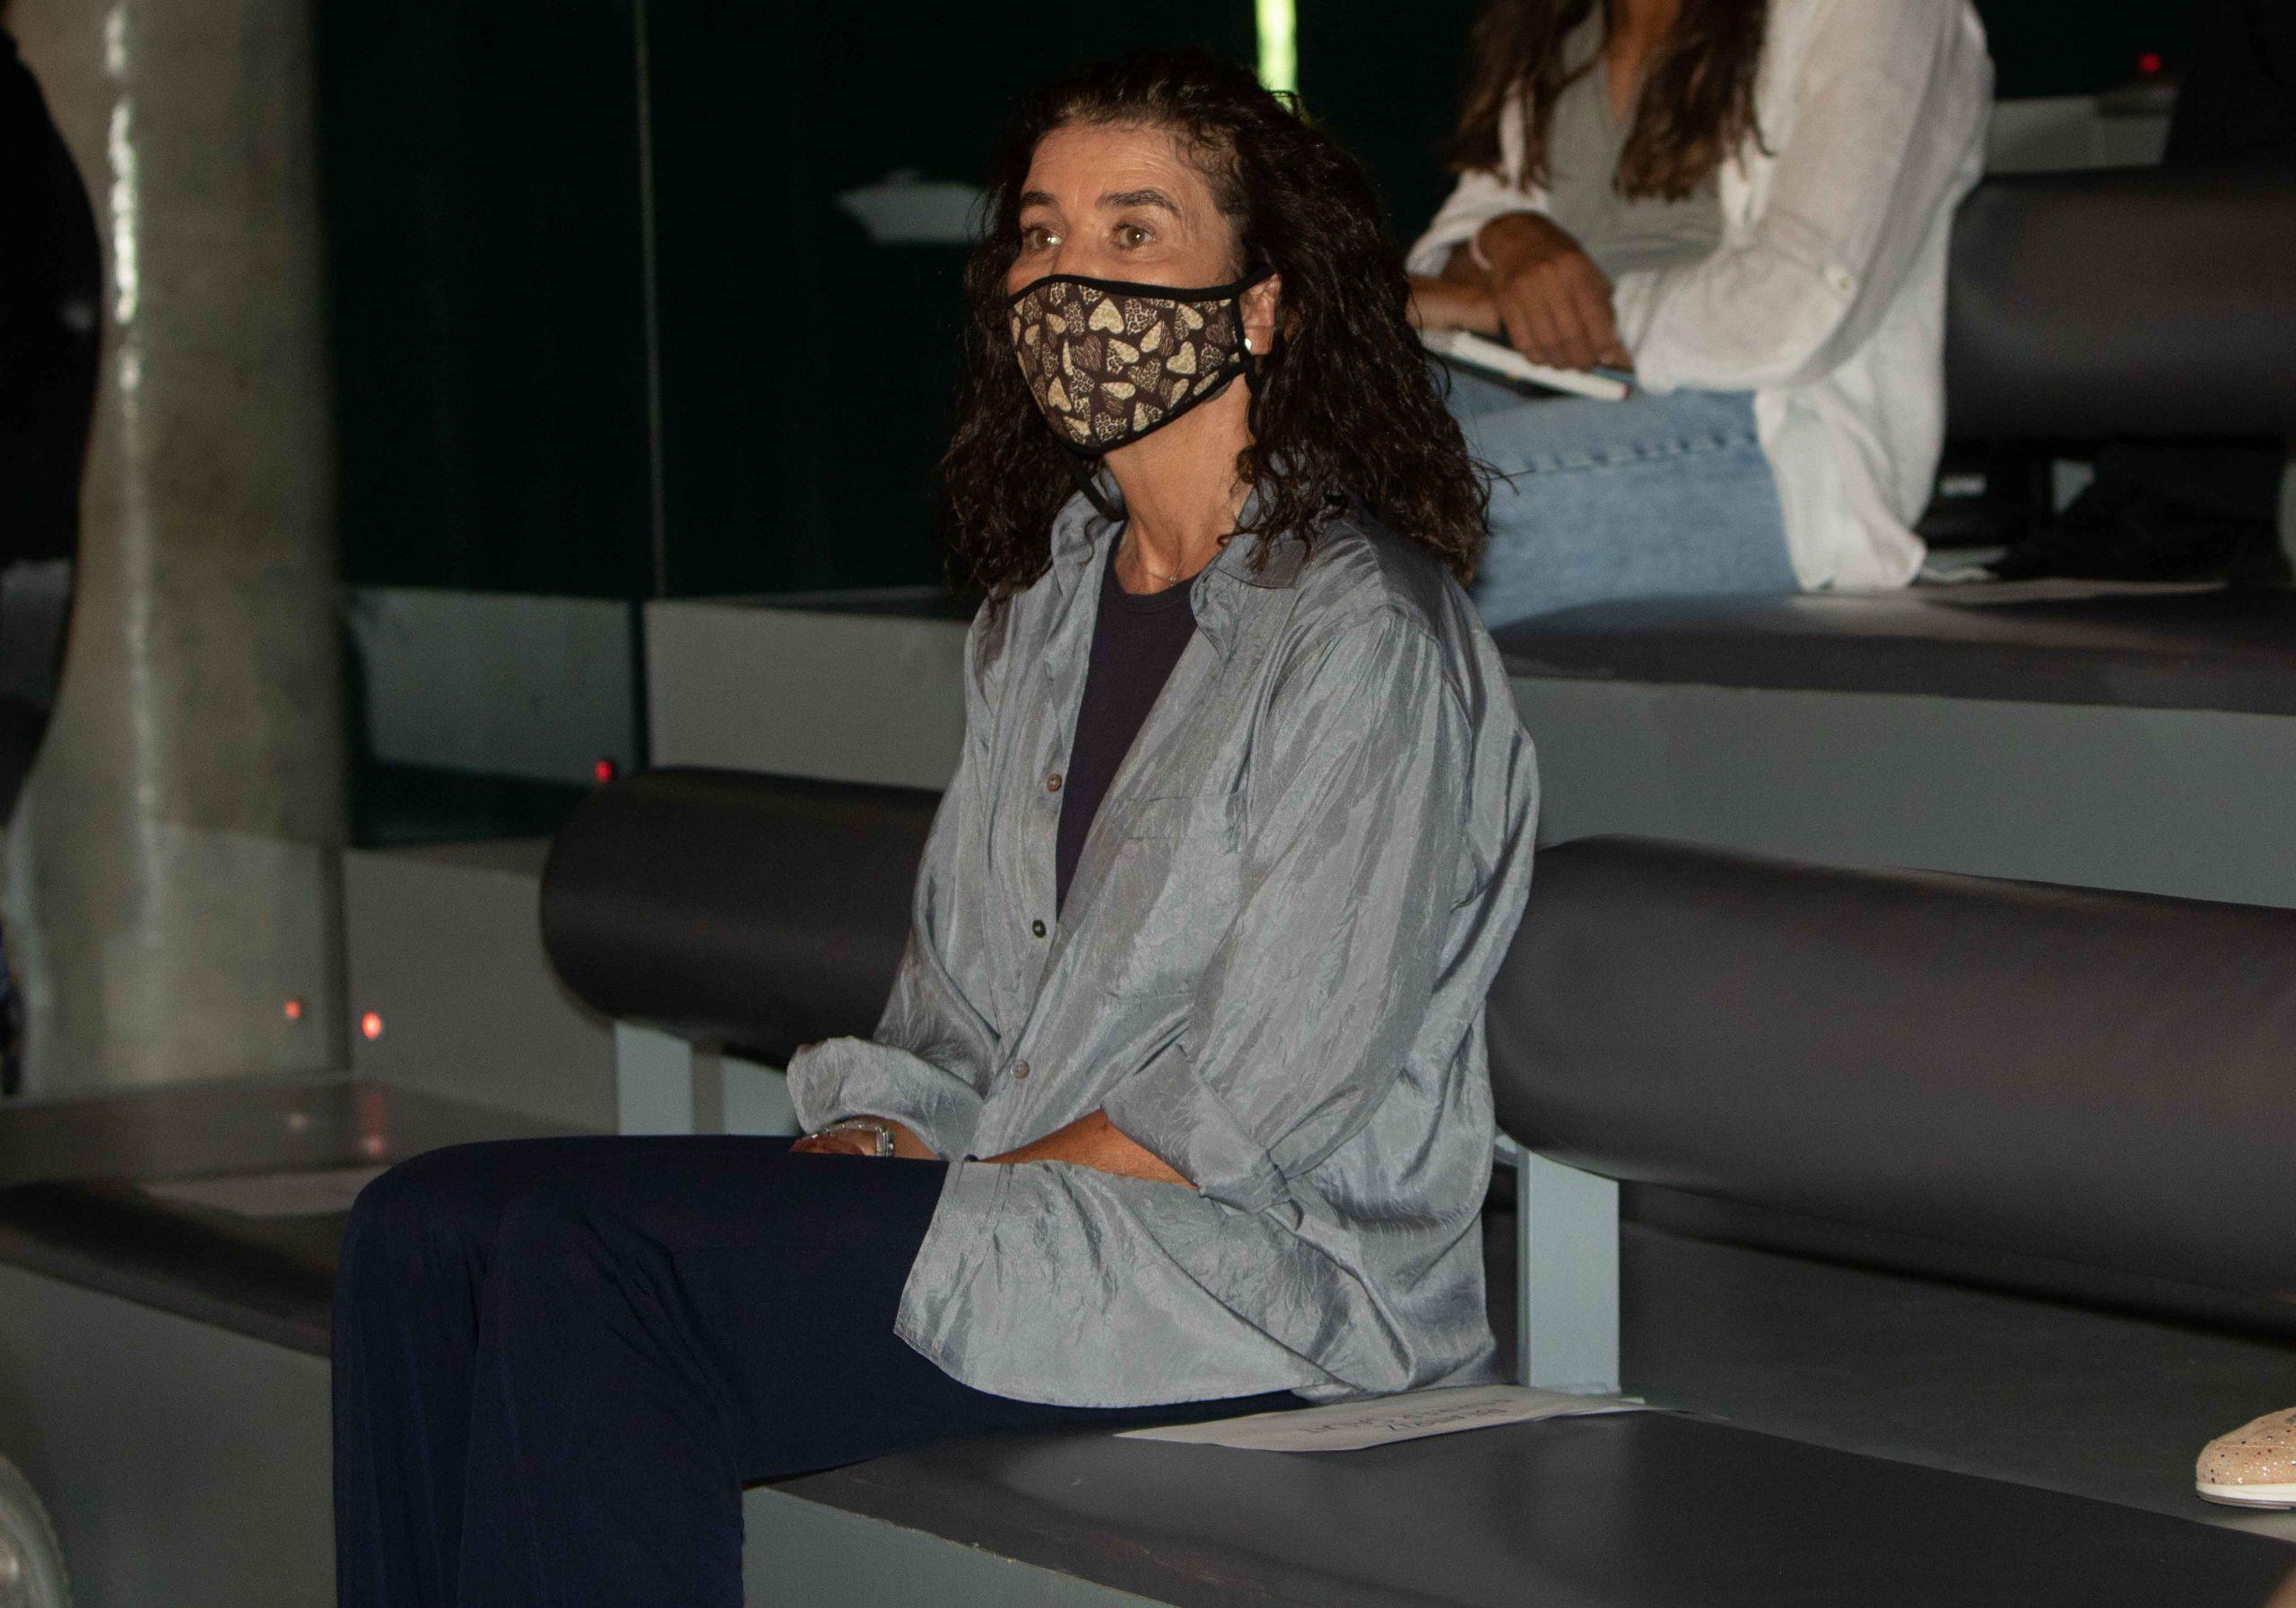 Beatriz_Ferrer_salat_museu_olimpic